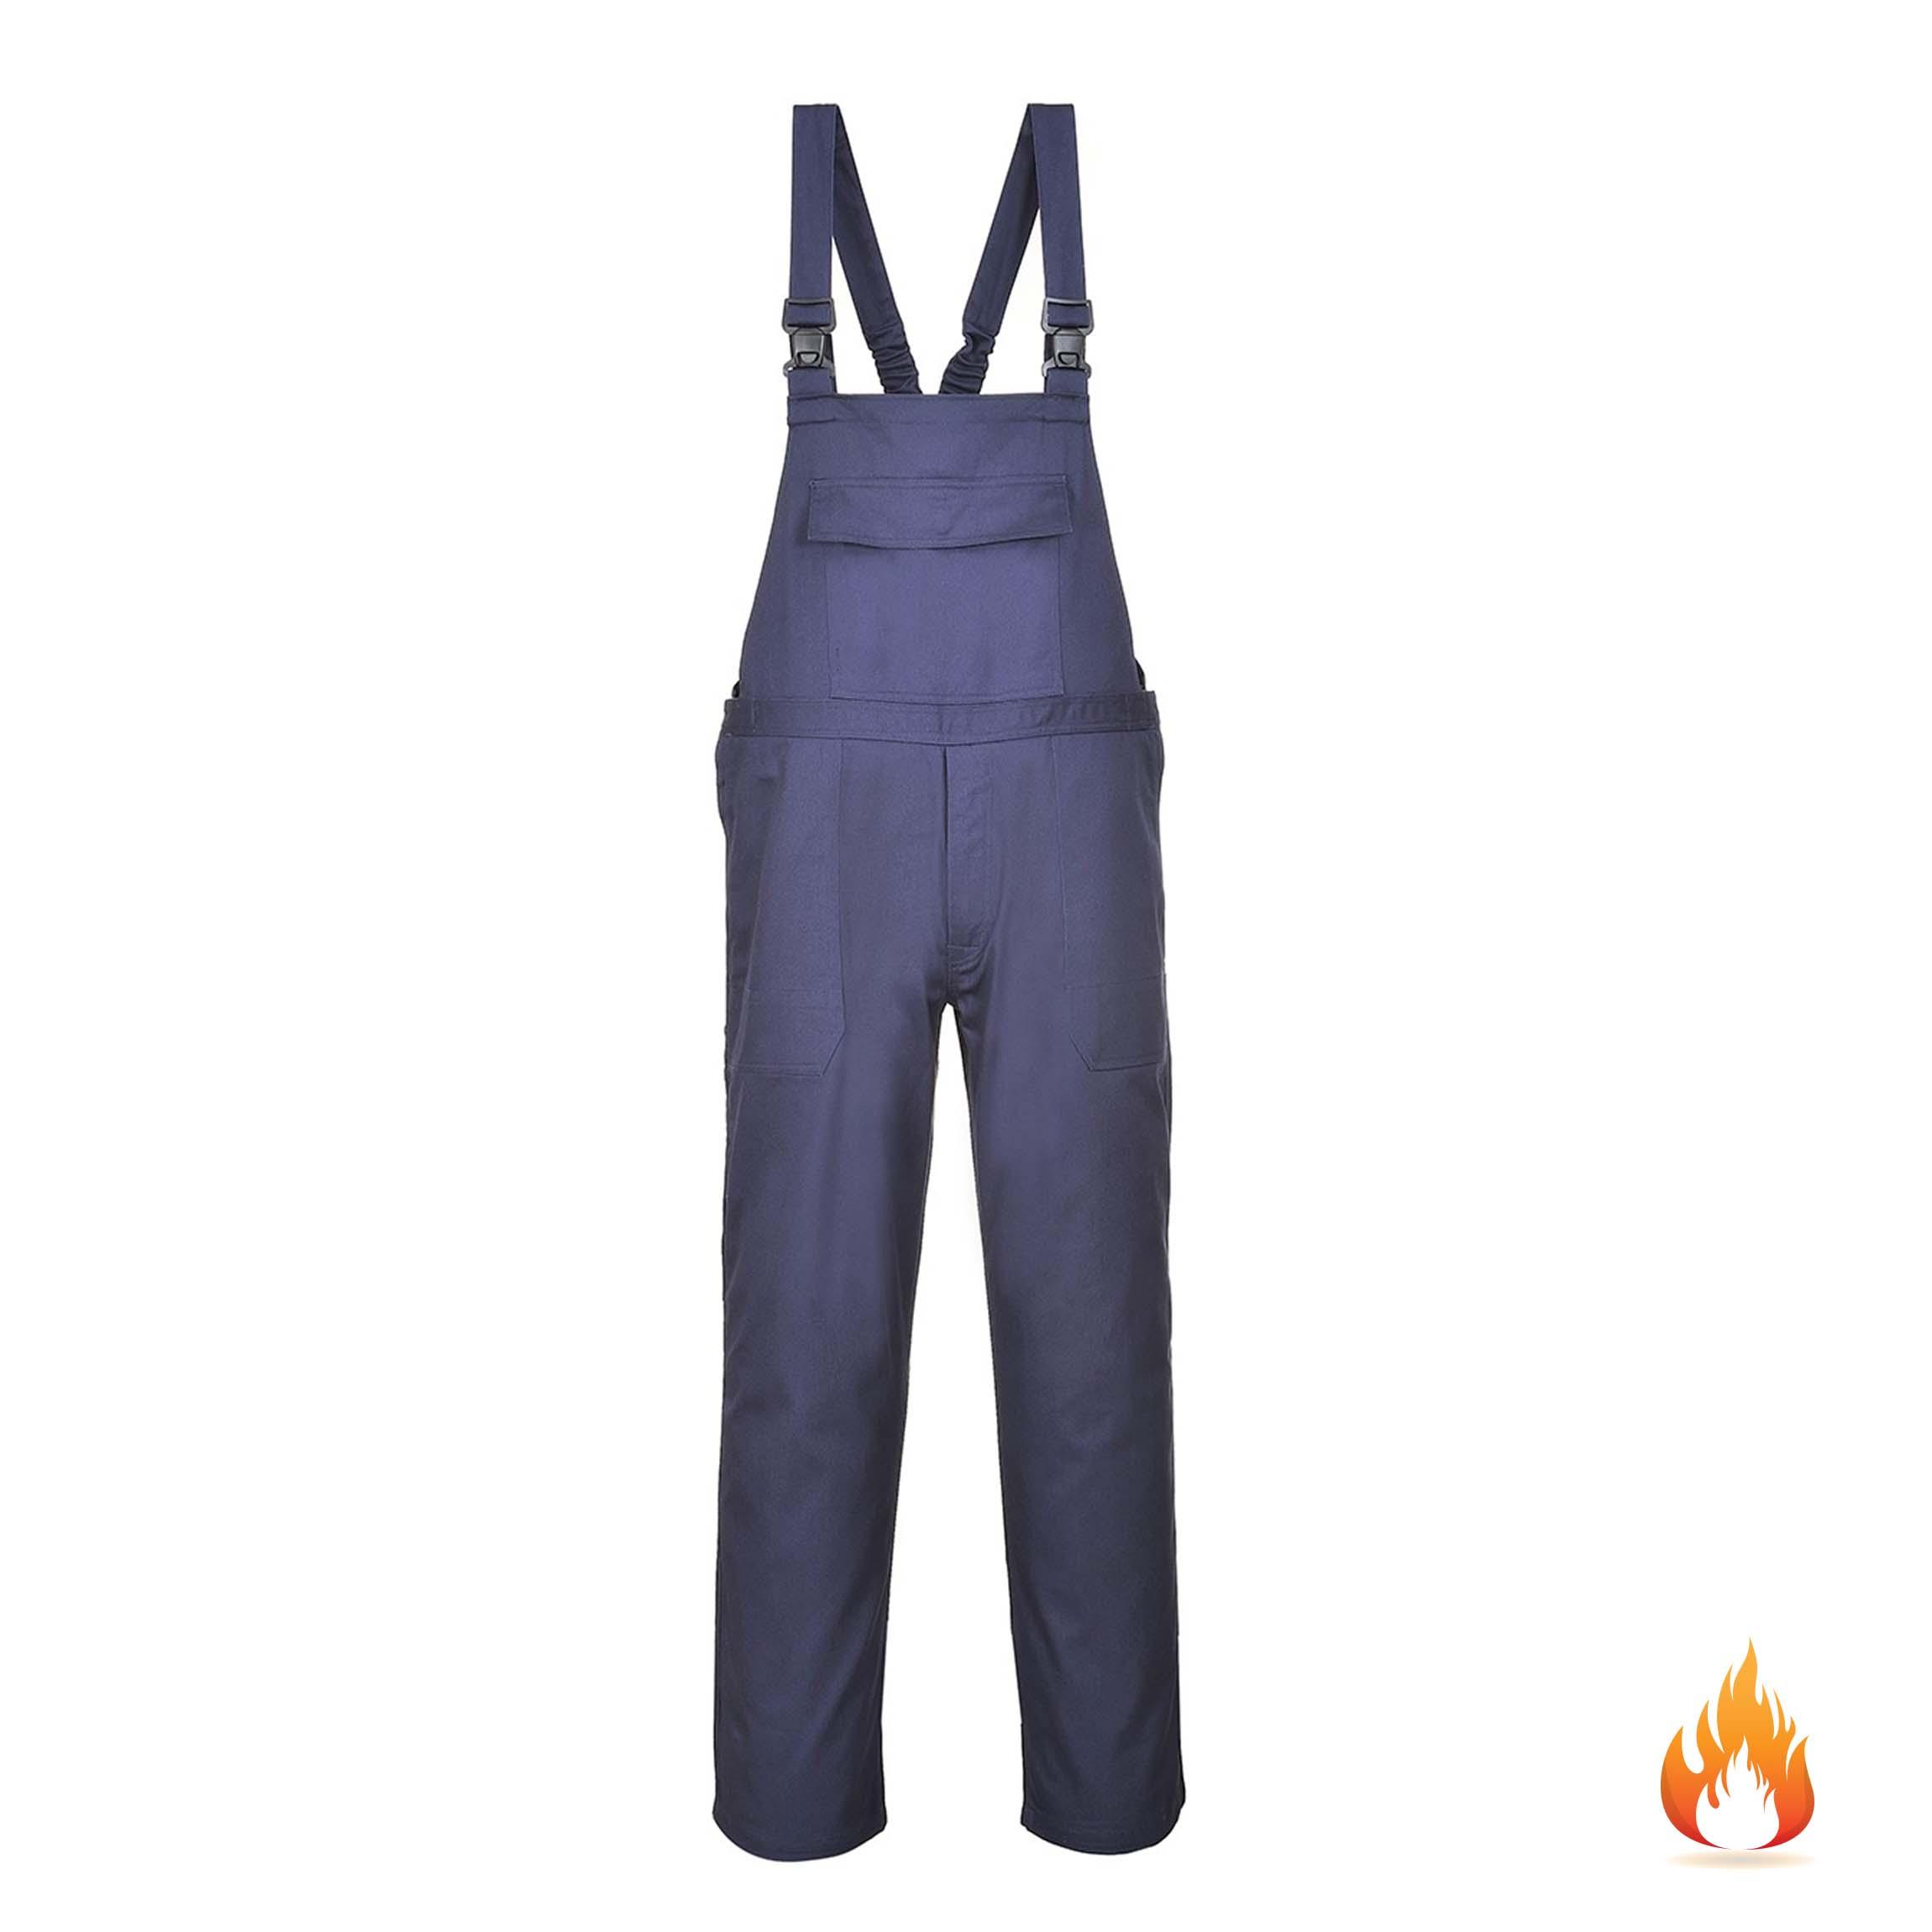 Vatrootporne radne hlače FR37